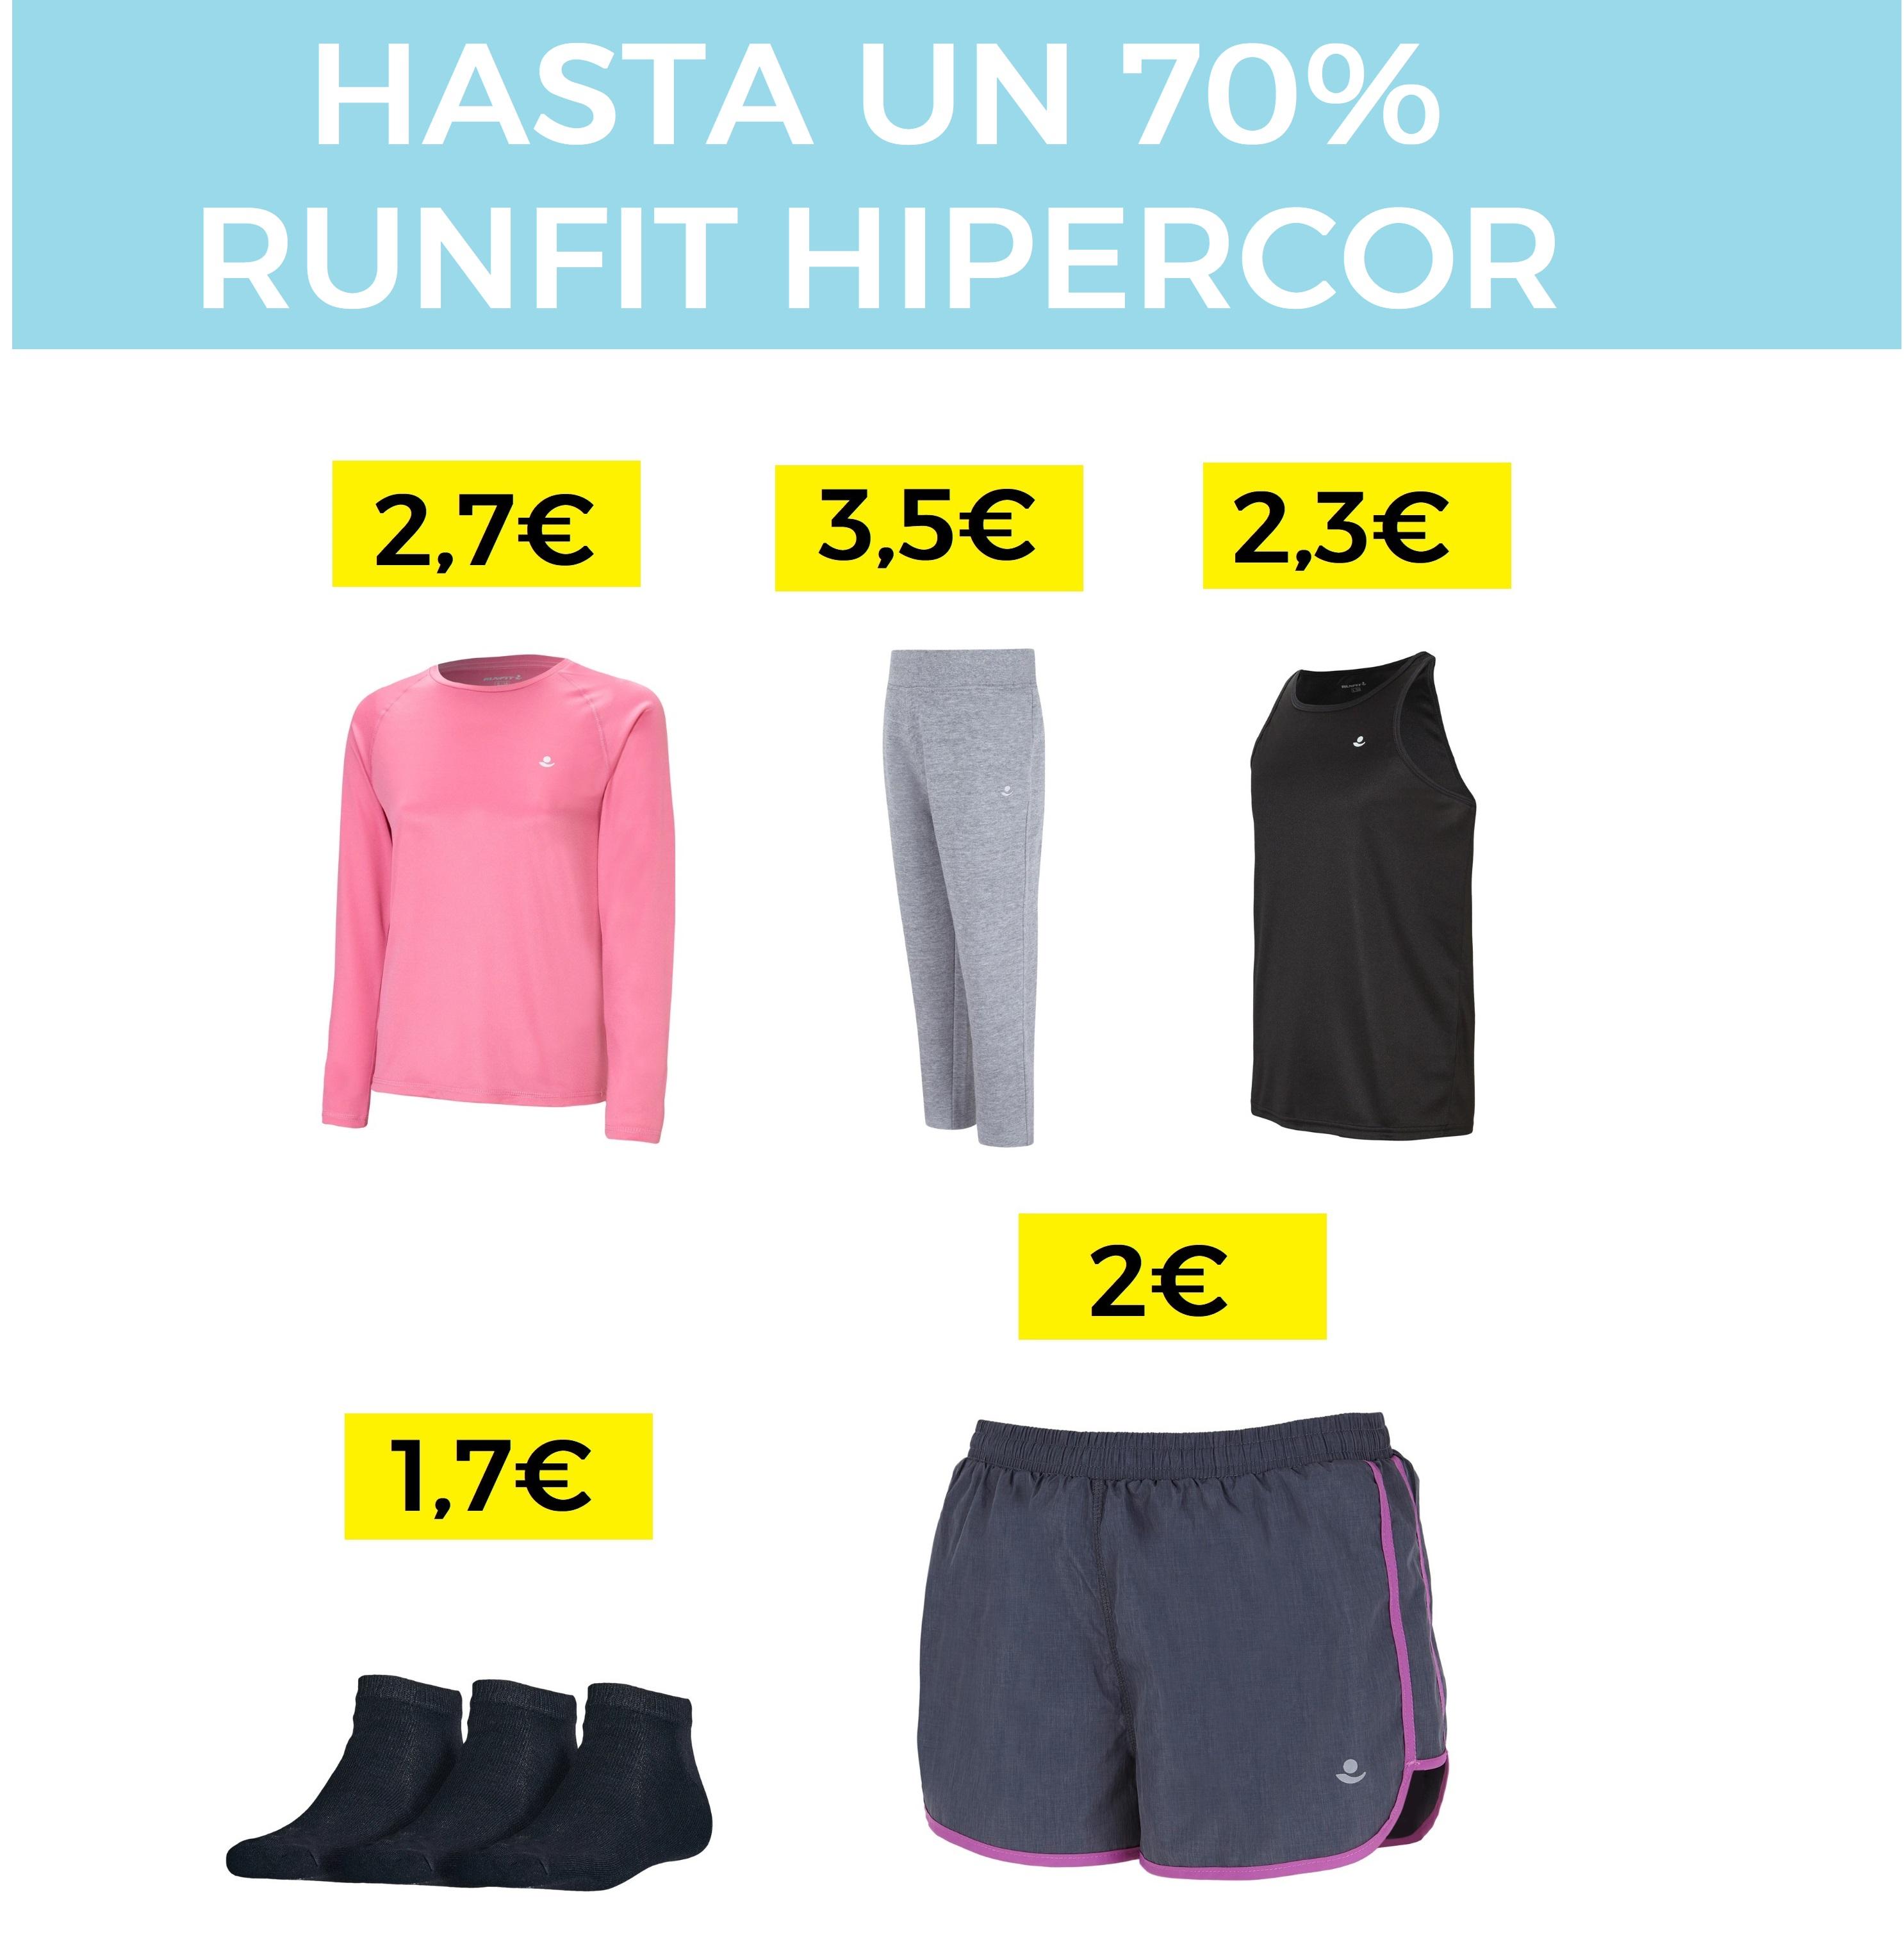 Chollazos en ropa deportiva Runfit desde 2€